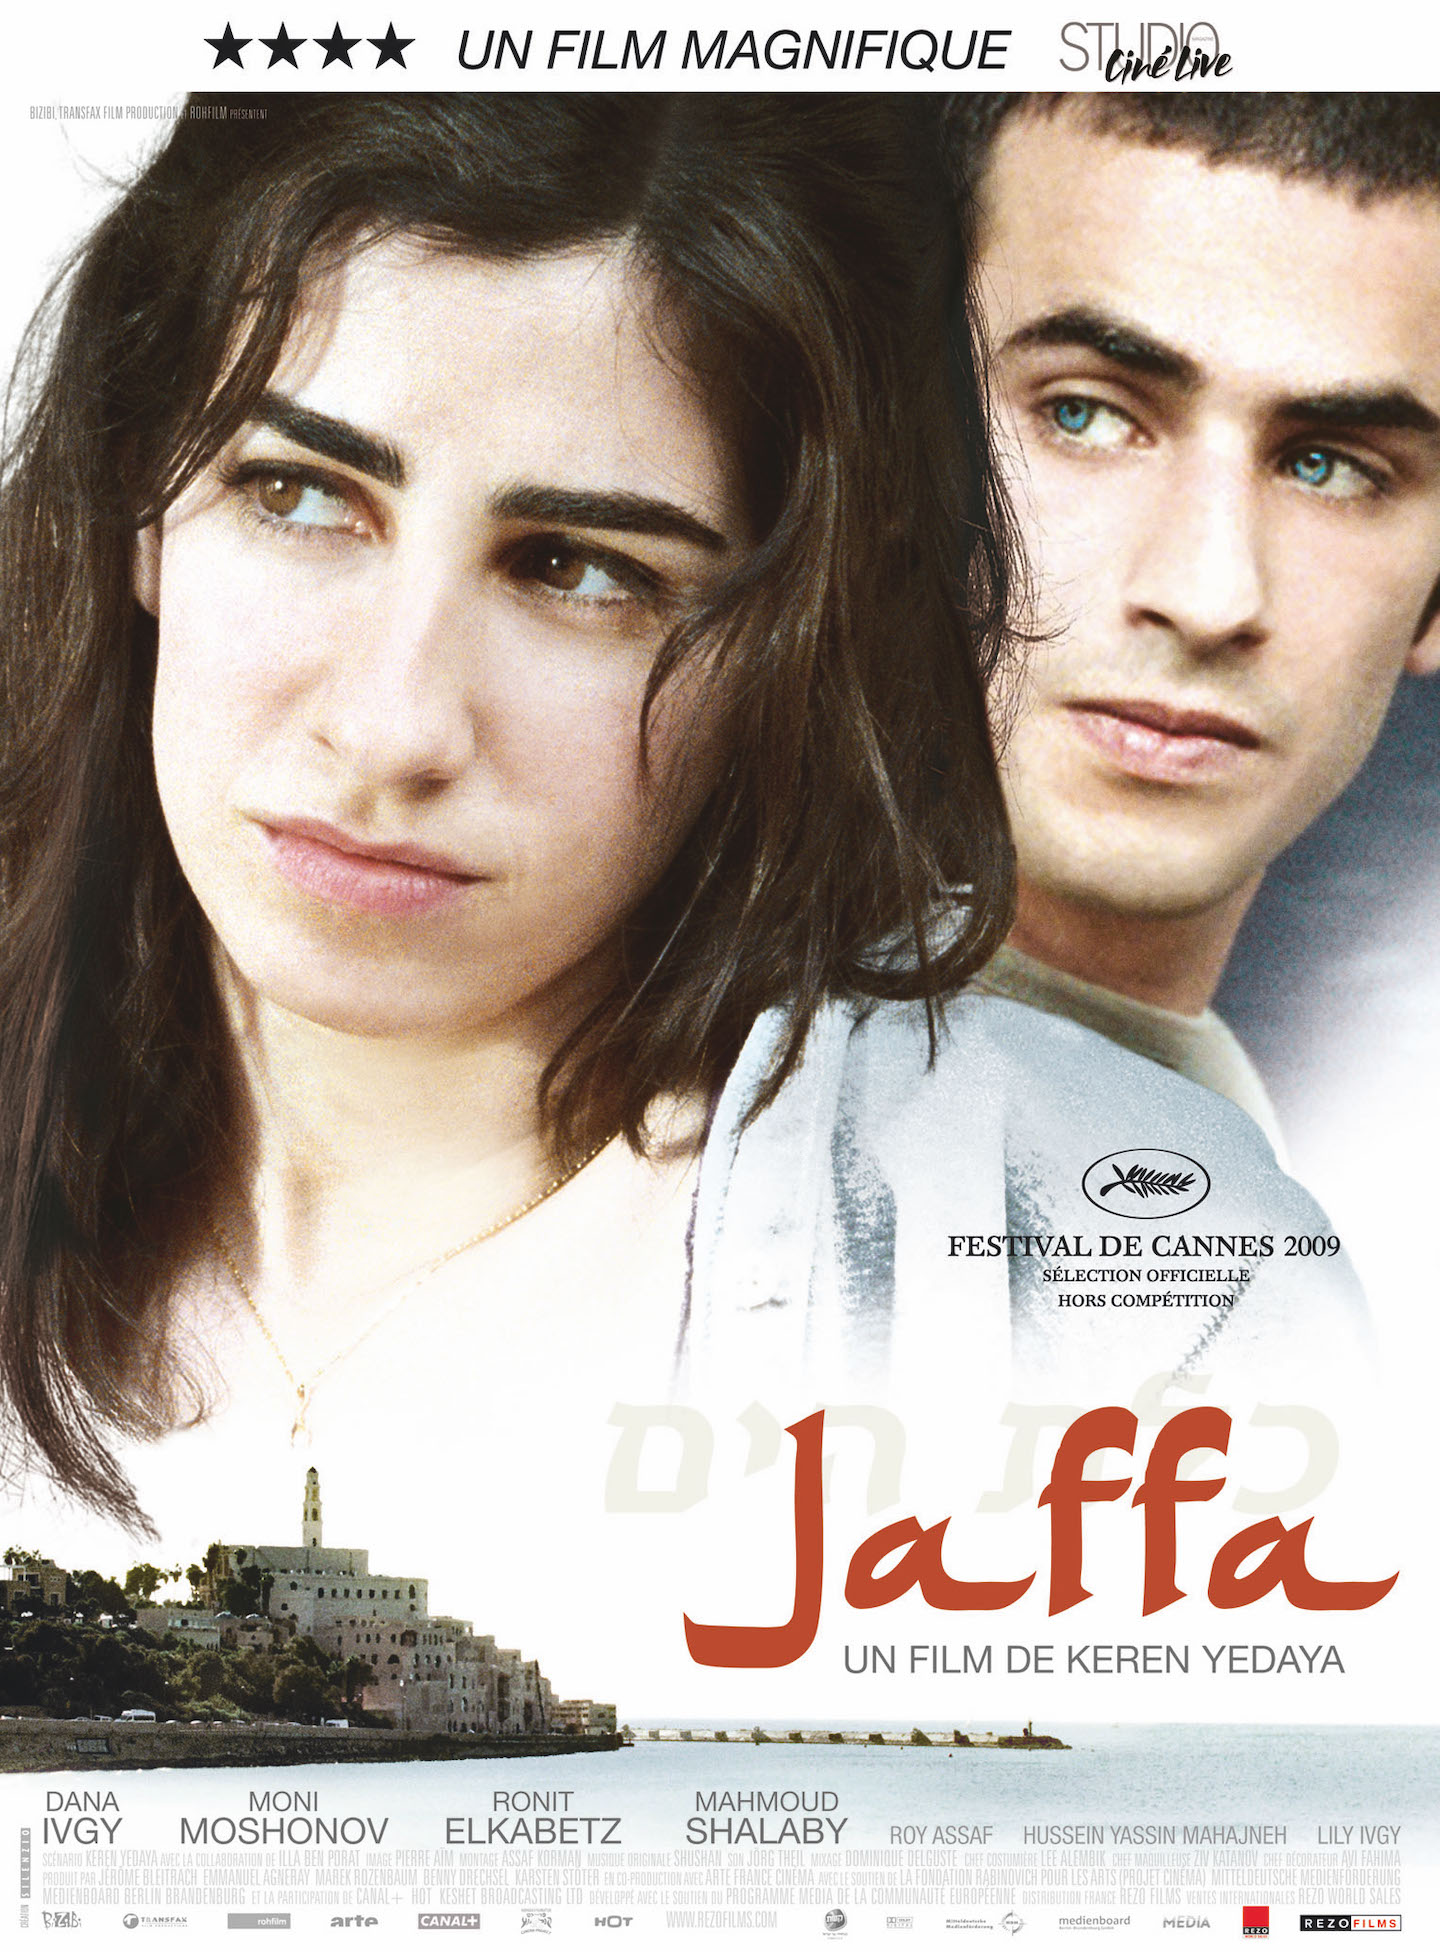 5 Affiche JAFFA.jpg